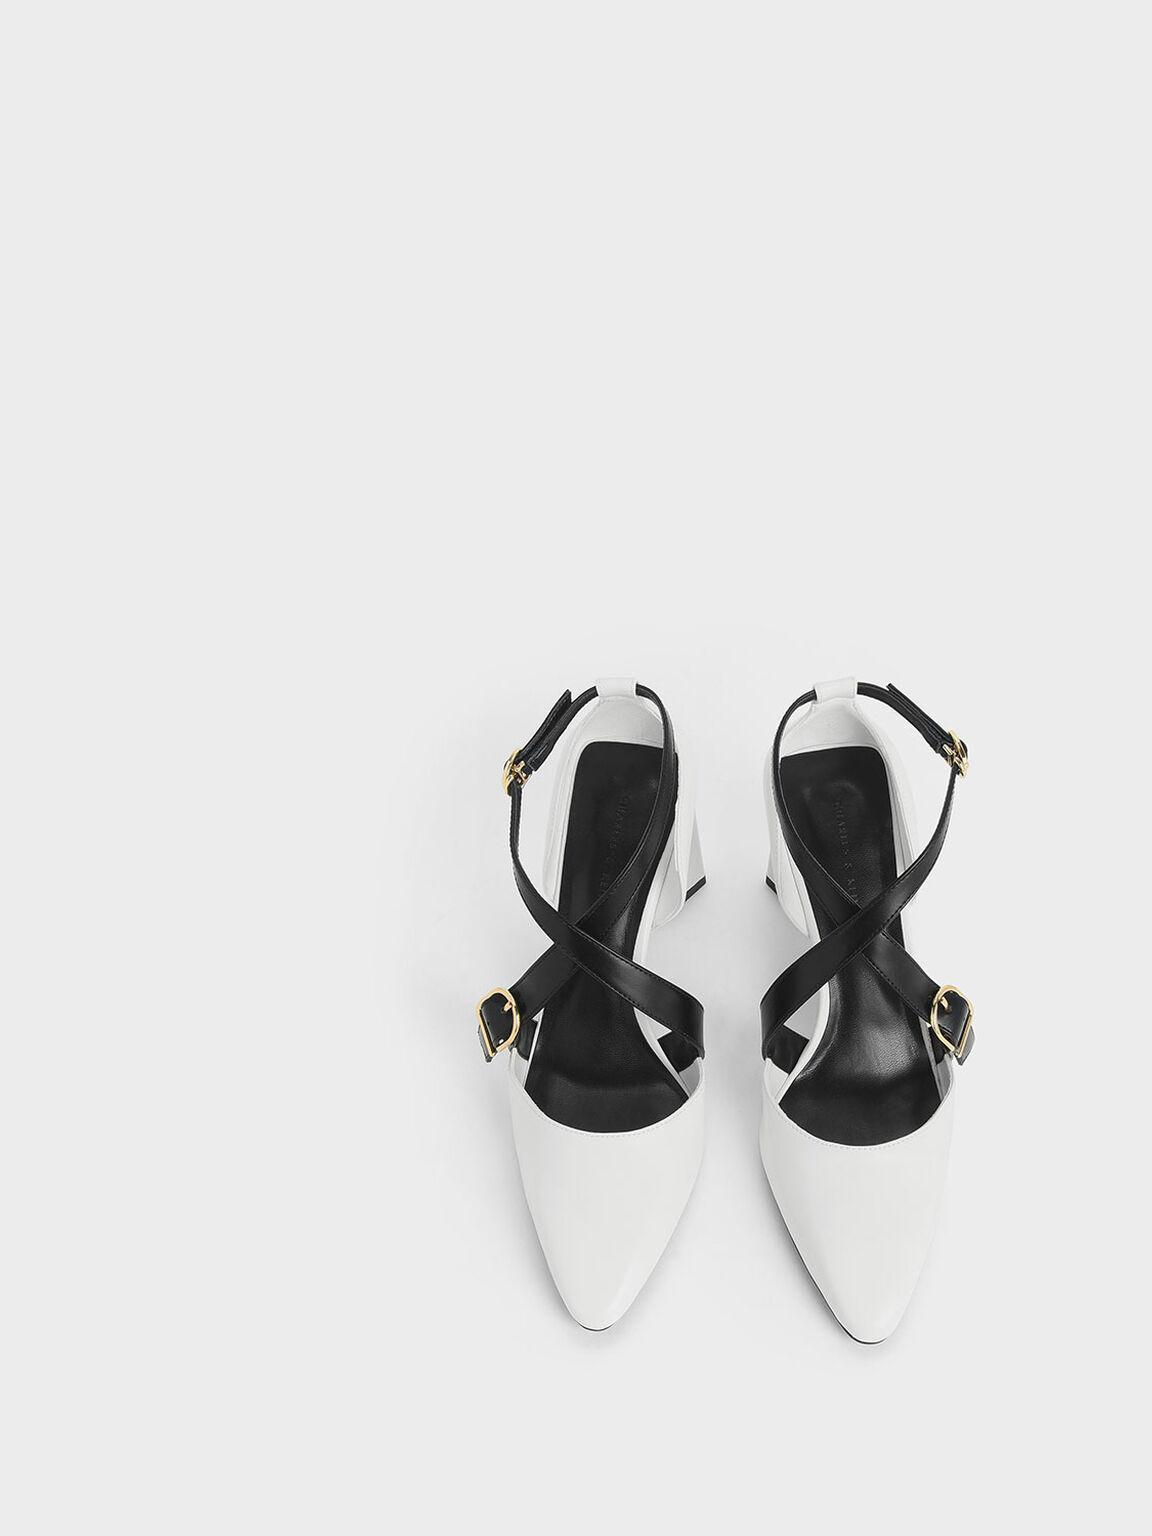 Two-Tone Buckle Detail Criss Cross Block Heel Pumps, White, hi-res